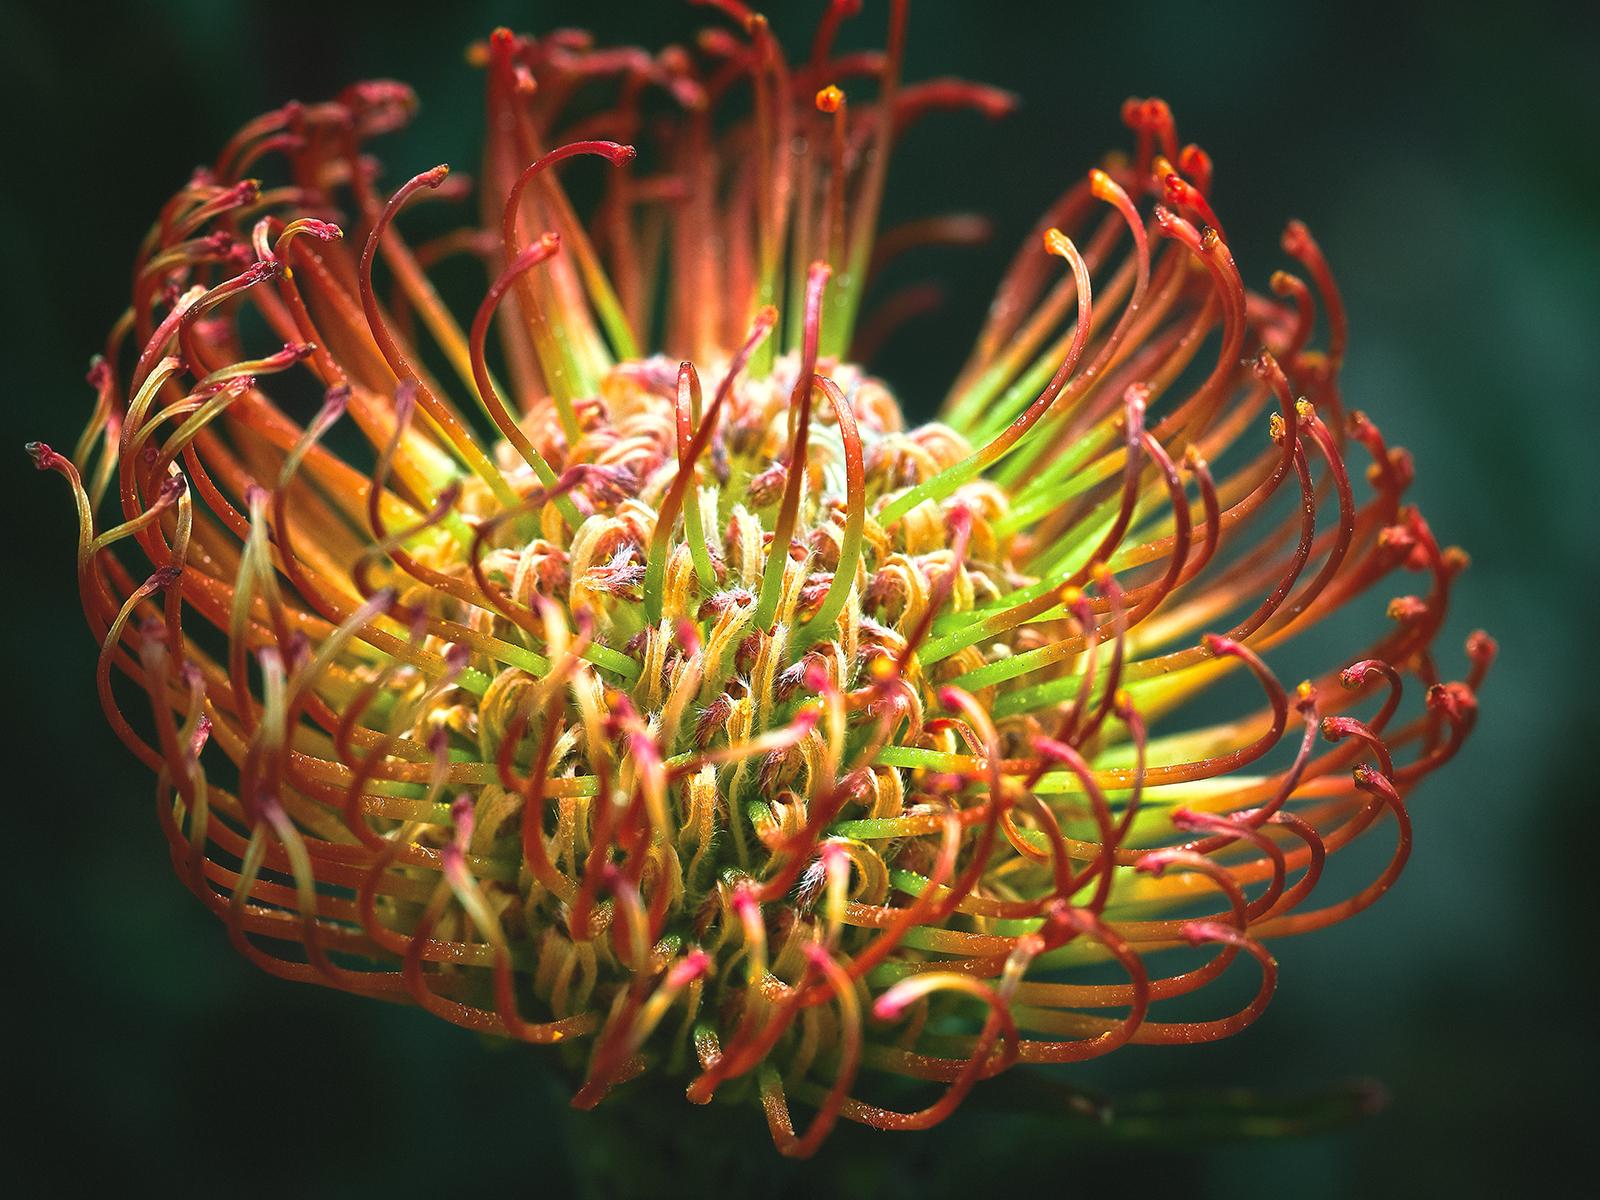 Red Pincushion Protea Flower